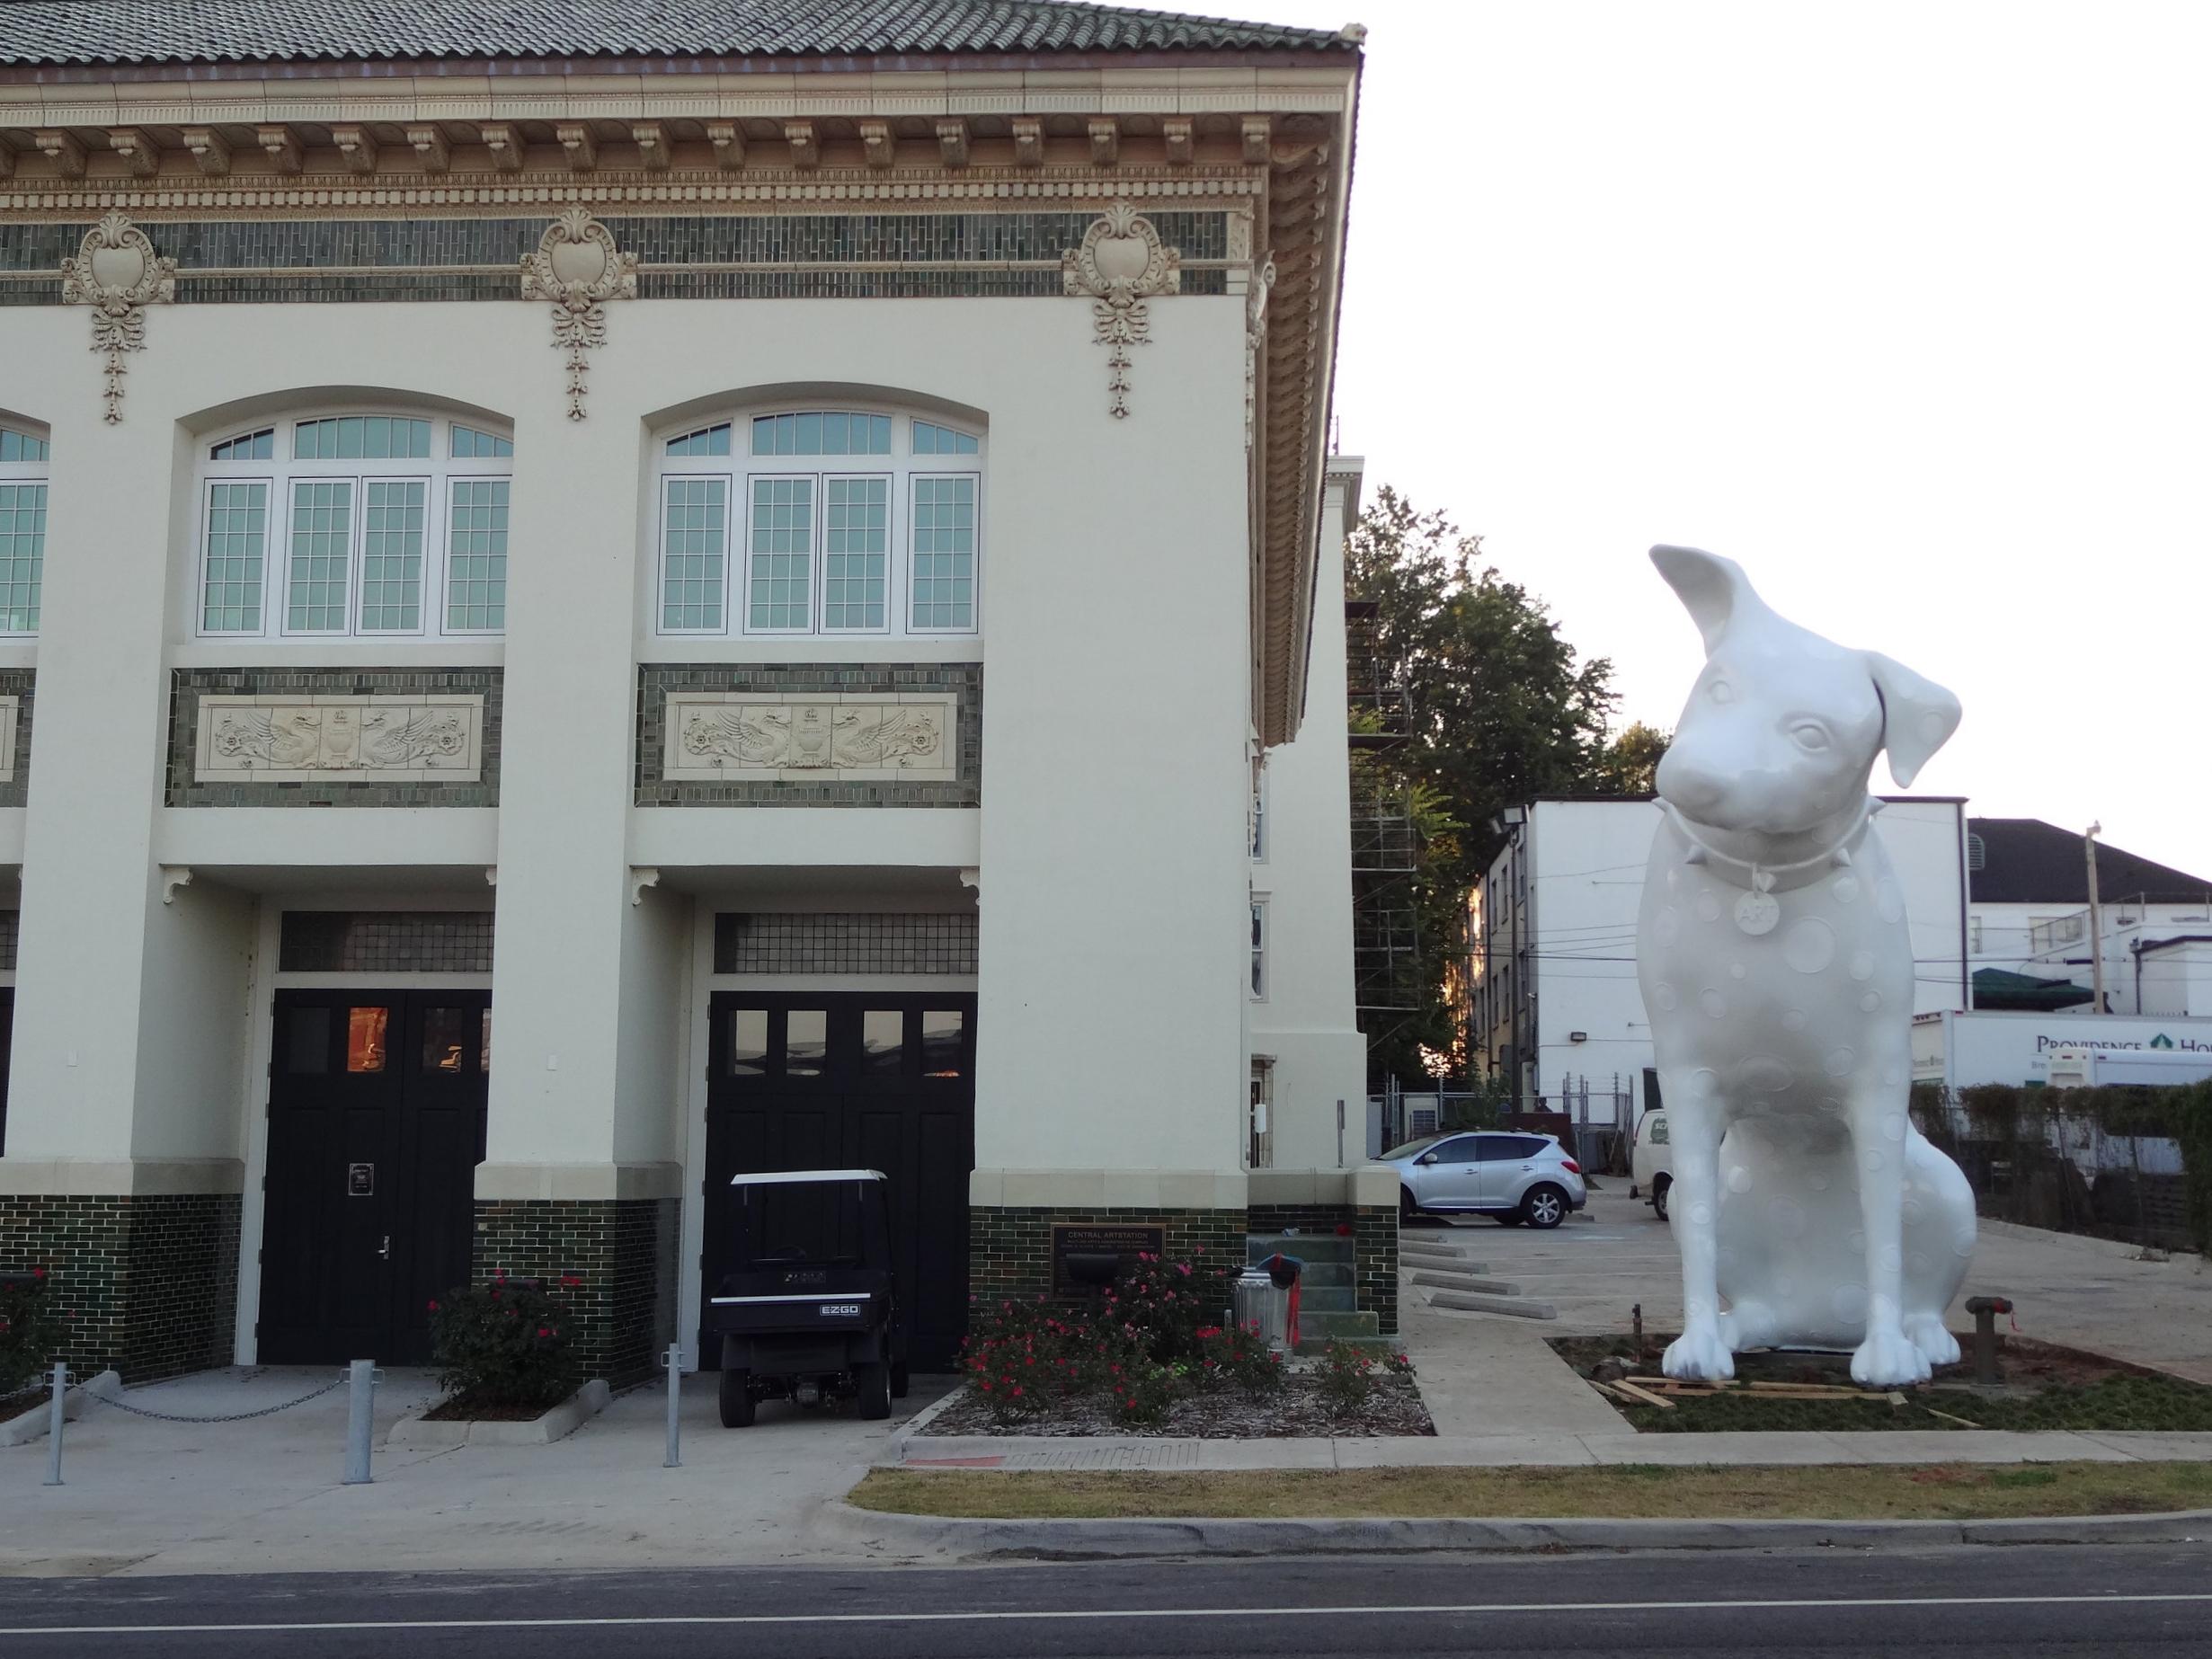 Shreveport_Art the Dalmation_Shreveport Regional Arts Council_Public Art Services_J Grant Projects_6.JPG